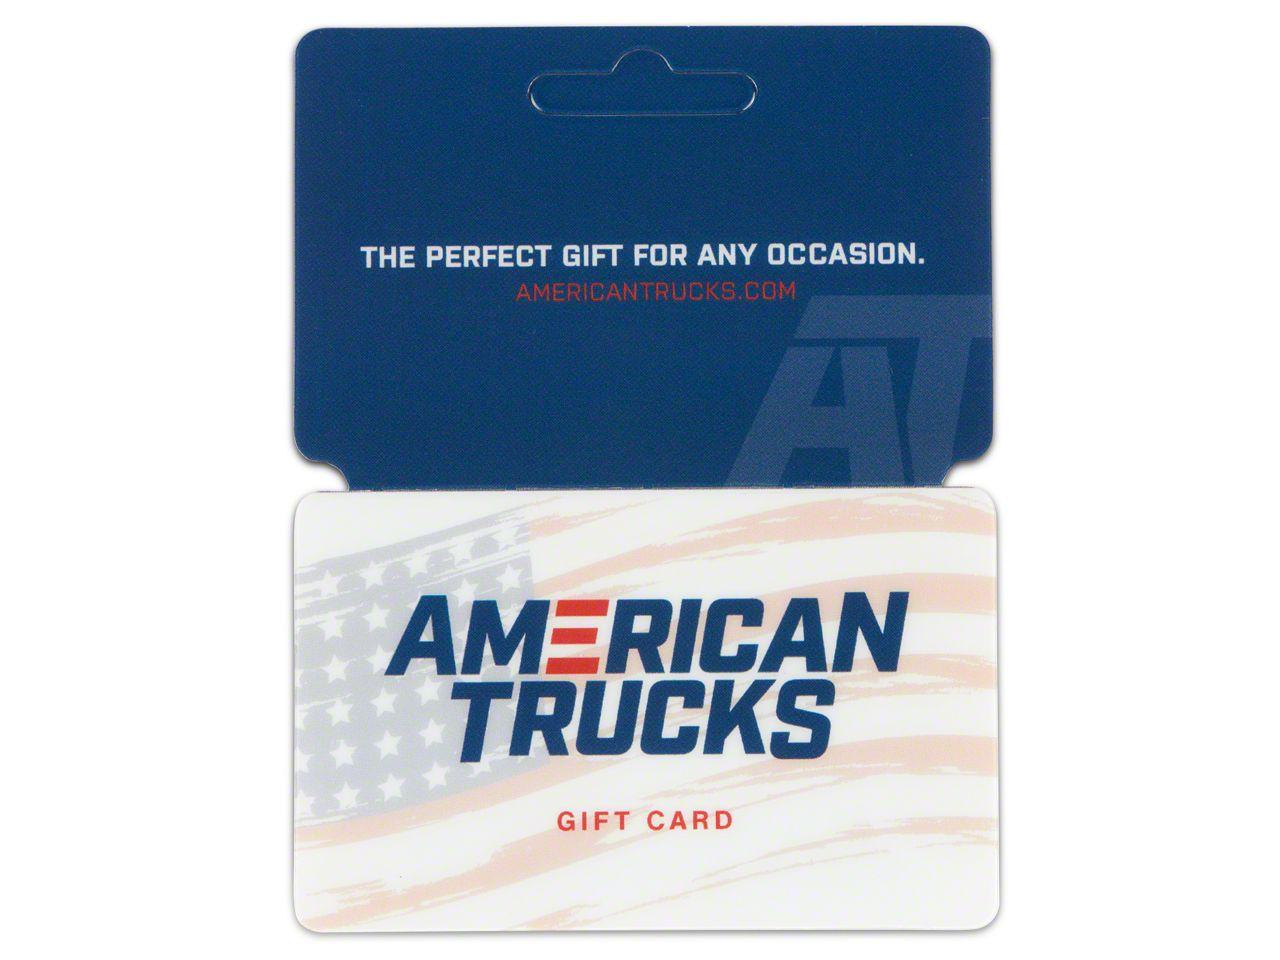 AmericanTrucks Gift Card / Gift Certificate (E-mailed)